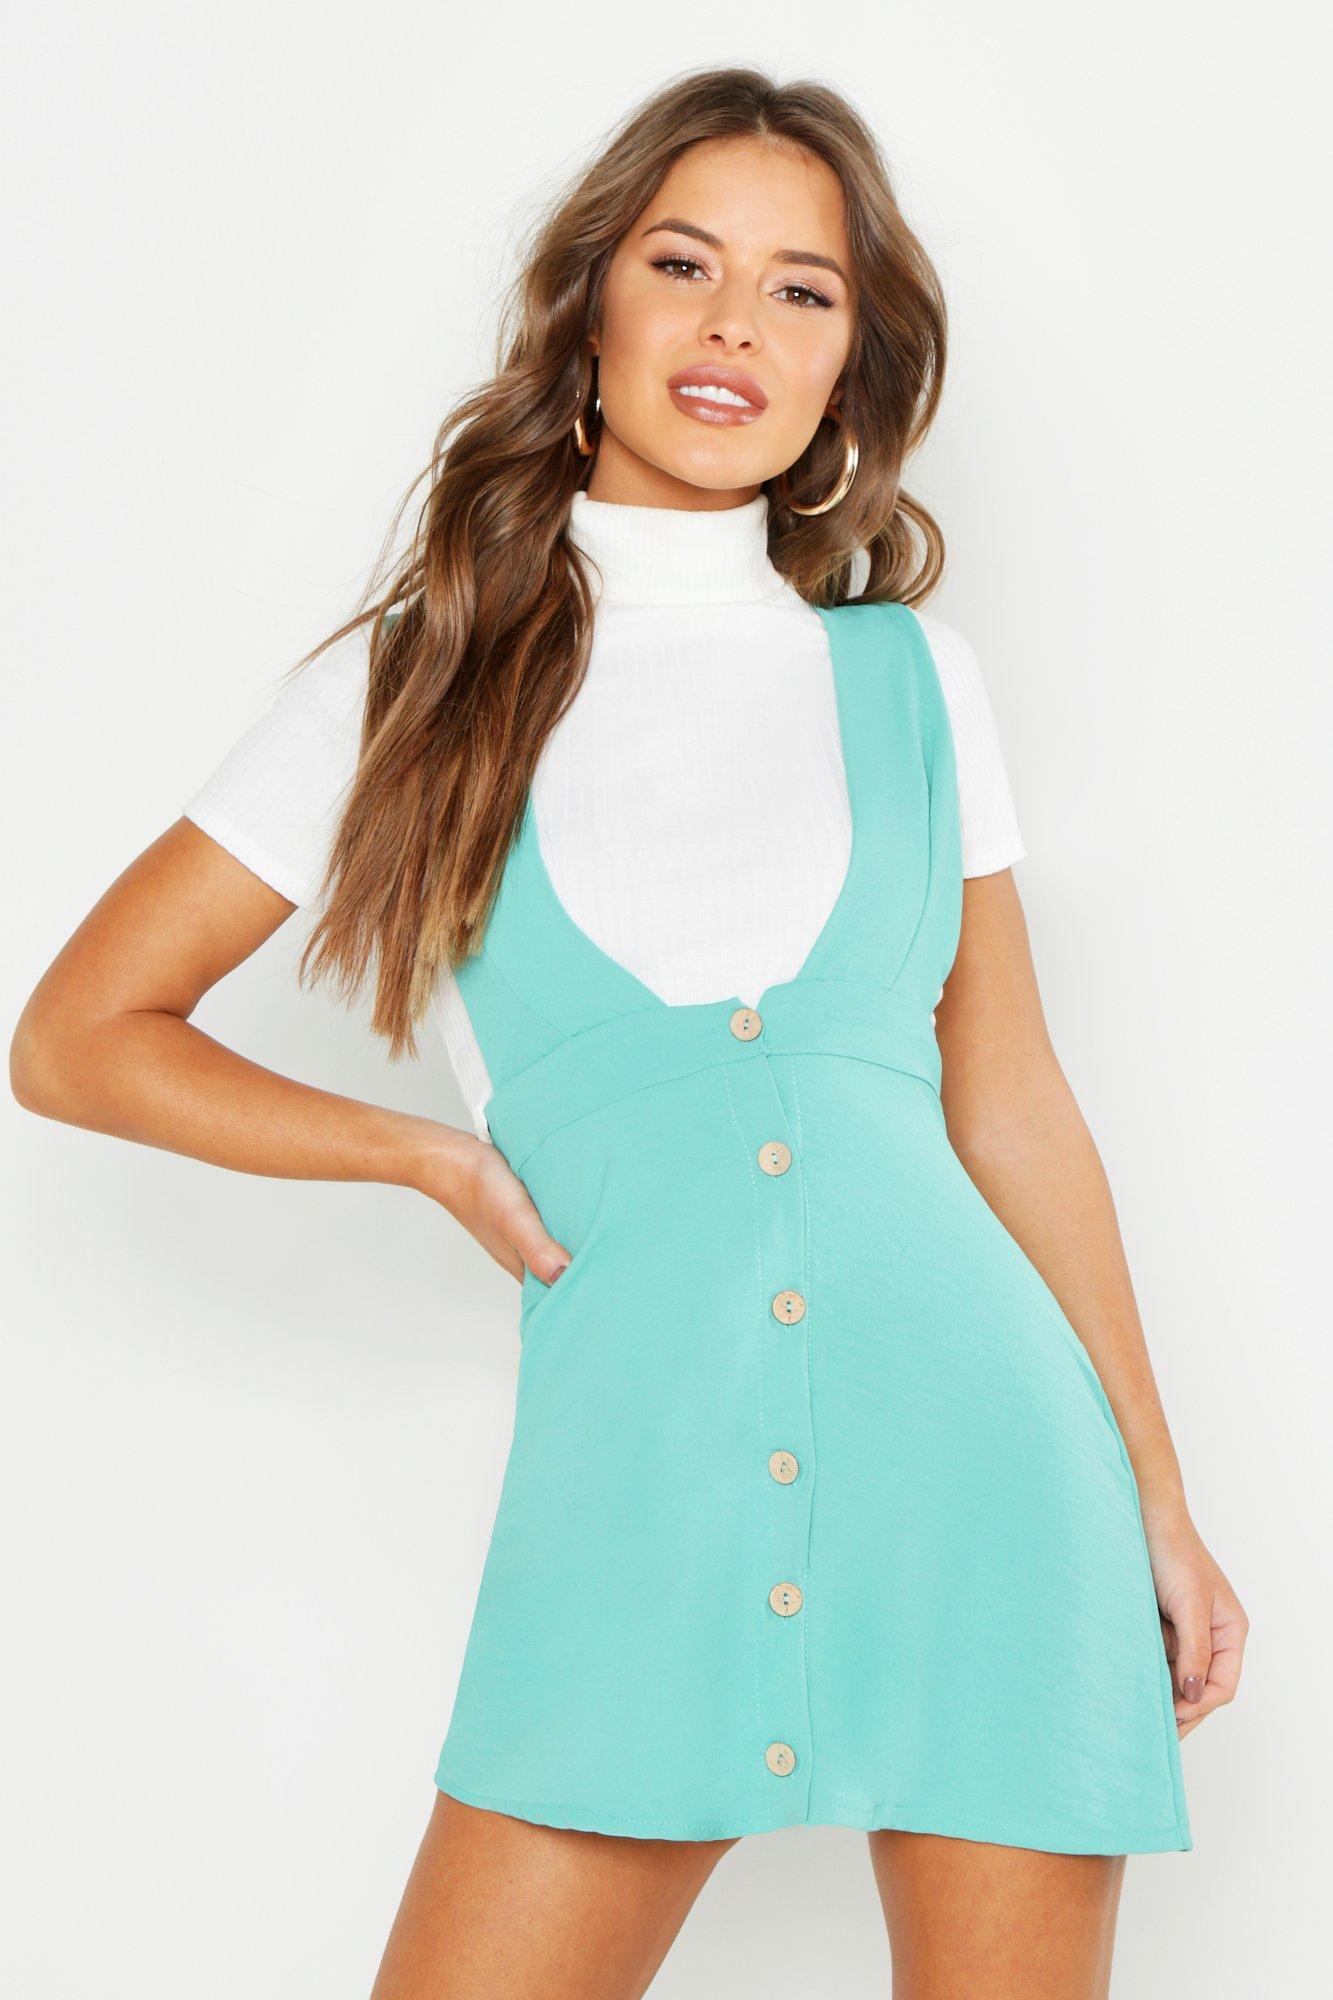 60s Dresses & 60s Style Dresses UK Petite Plunge Front Button Pinafore Dress  AT vintagedancer.com